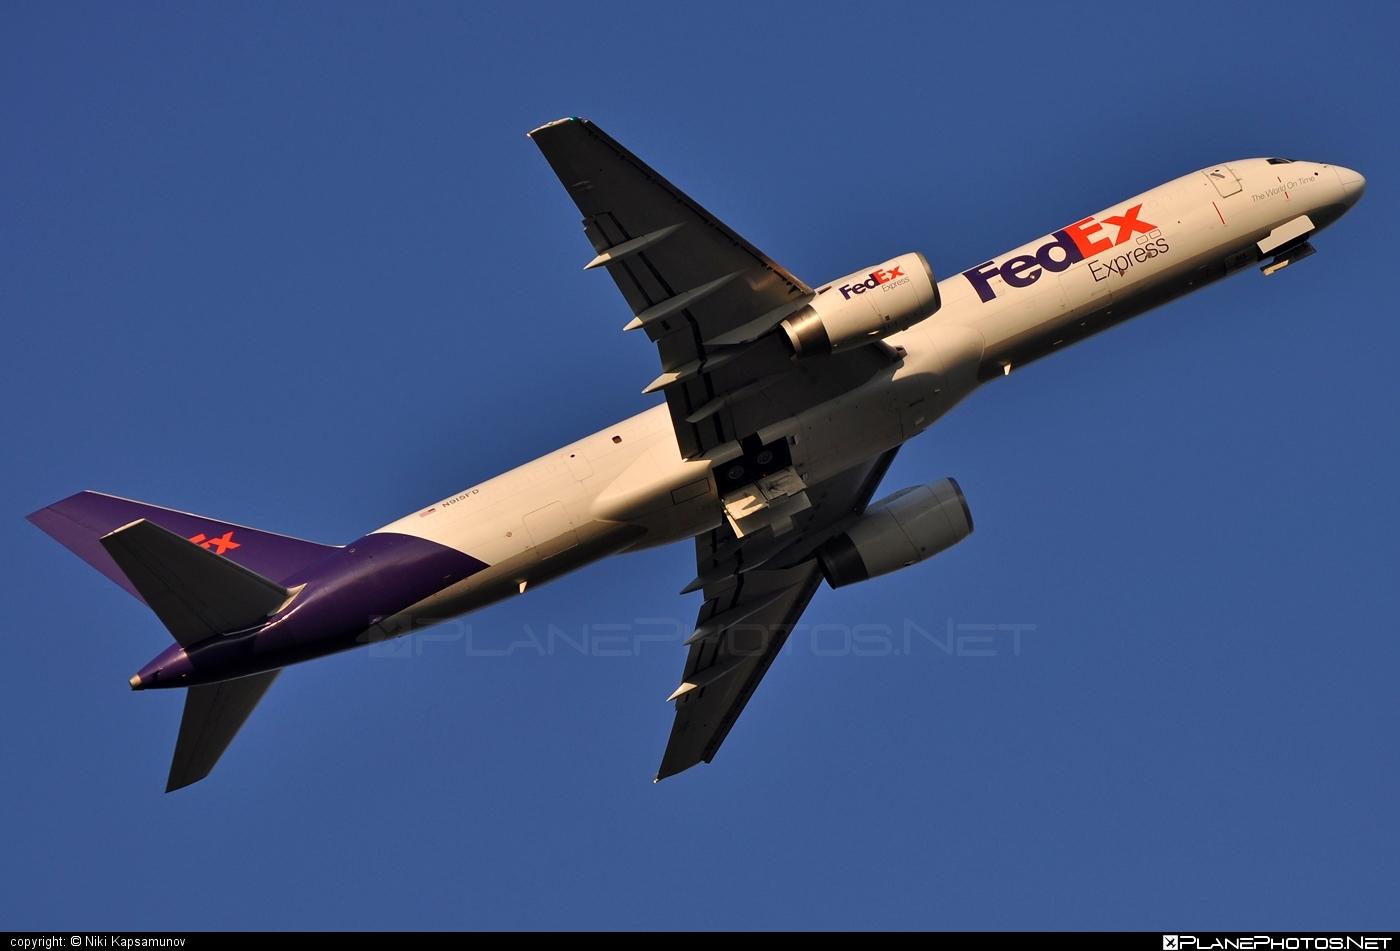 Boeing 757-200 - N915FD operated by FedEx Express #b757 #boeing #boeing757 #fedex #fedexairlines #fedexexpress